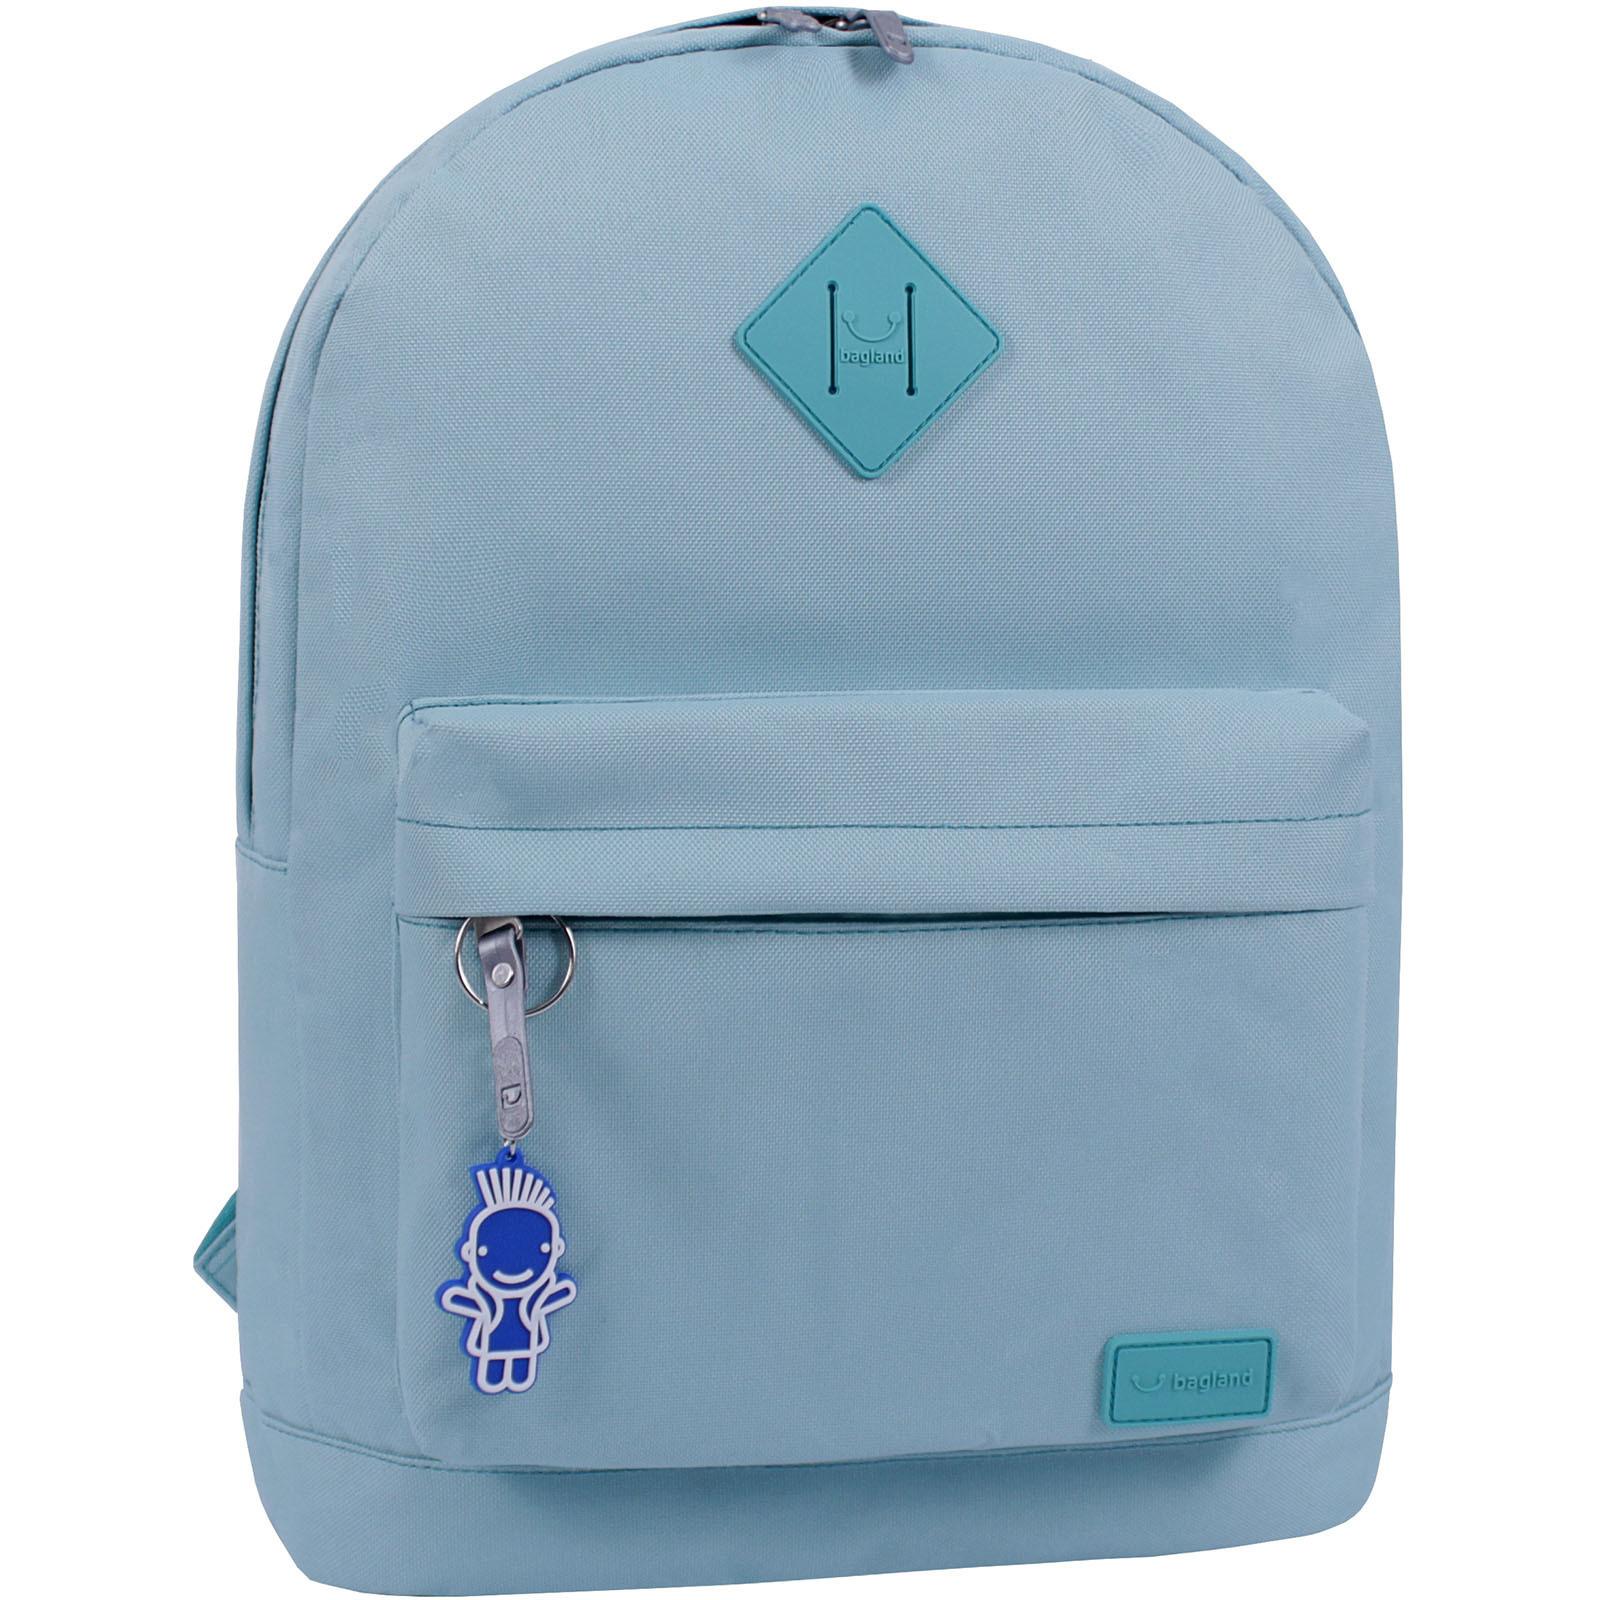 Городские рюкзаки Рюкзак Bagland Молодежный W/R 17 л. тиффани (00533662) IMG_0753.JPG